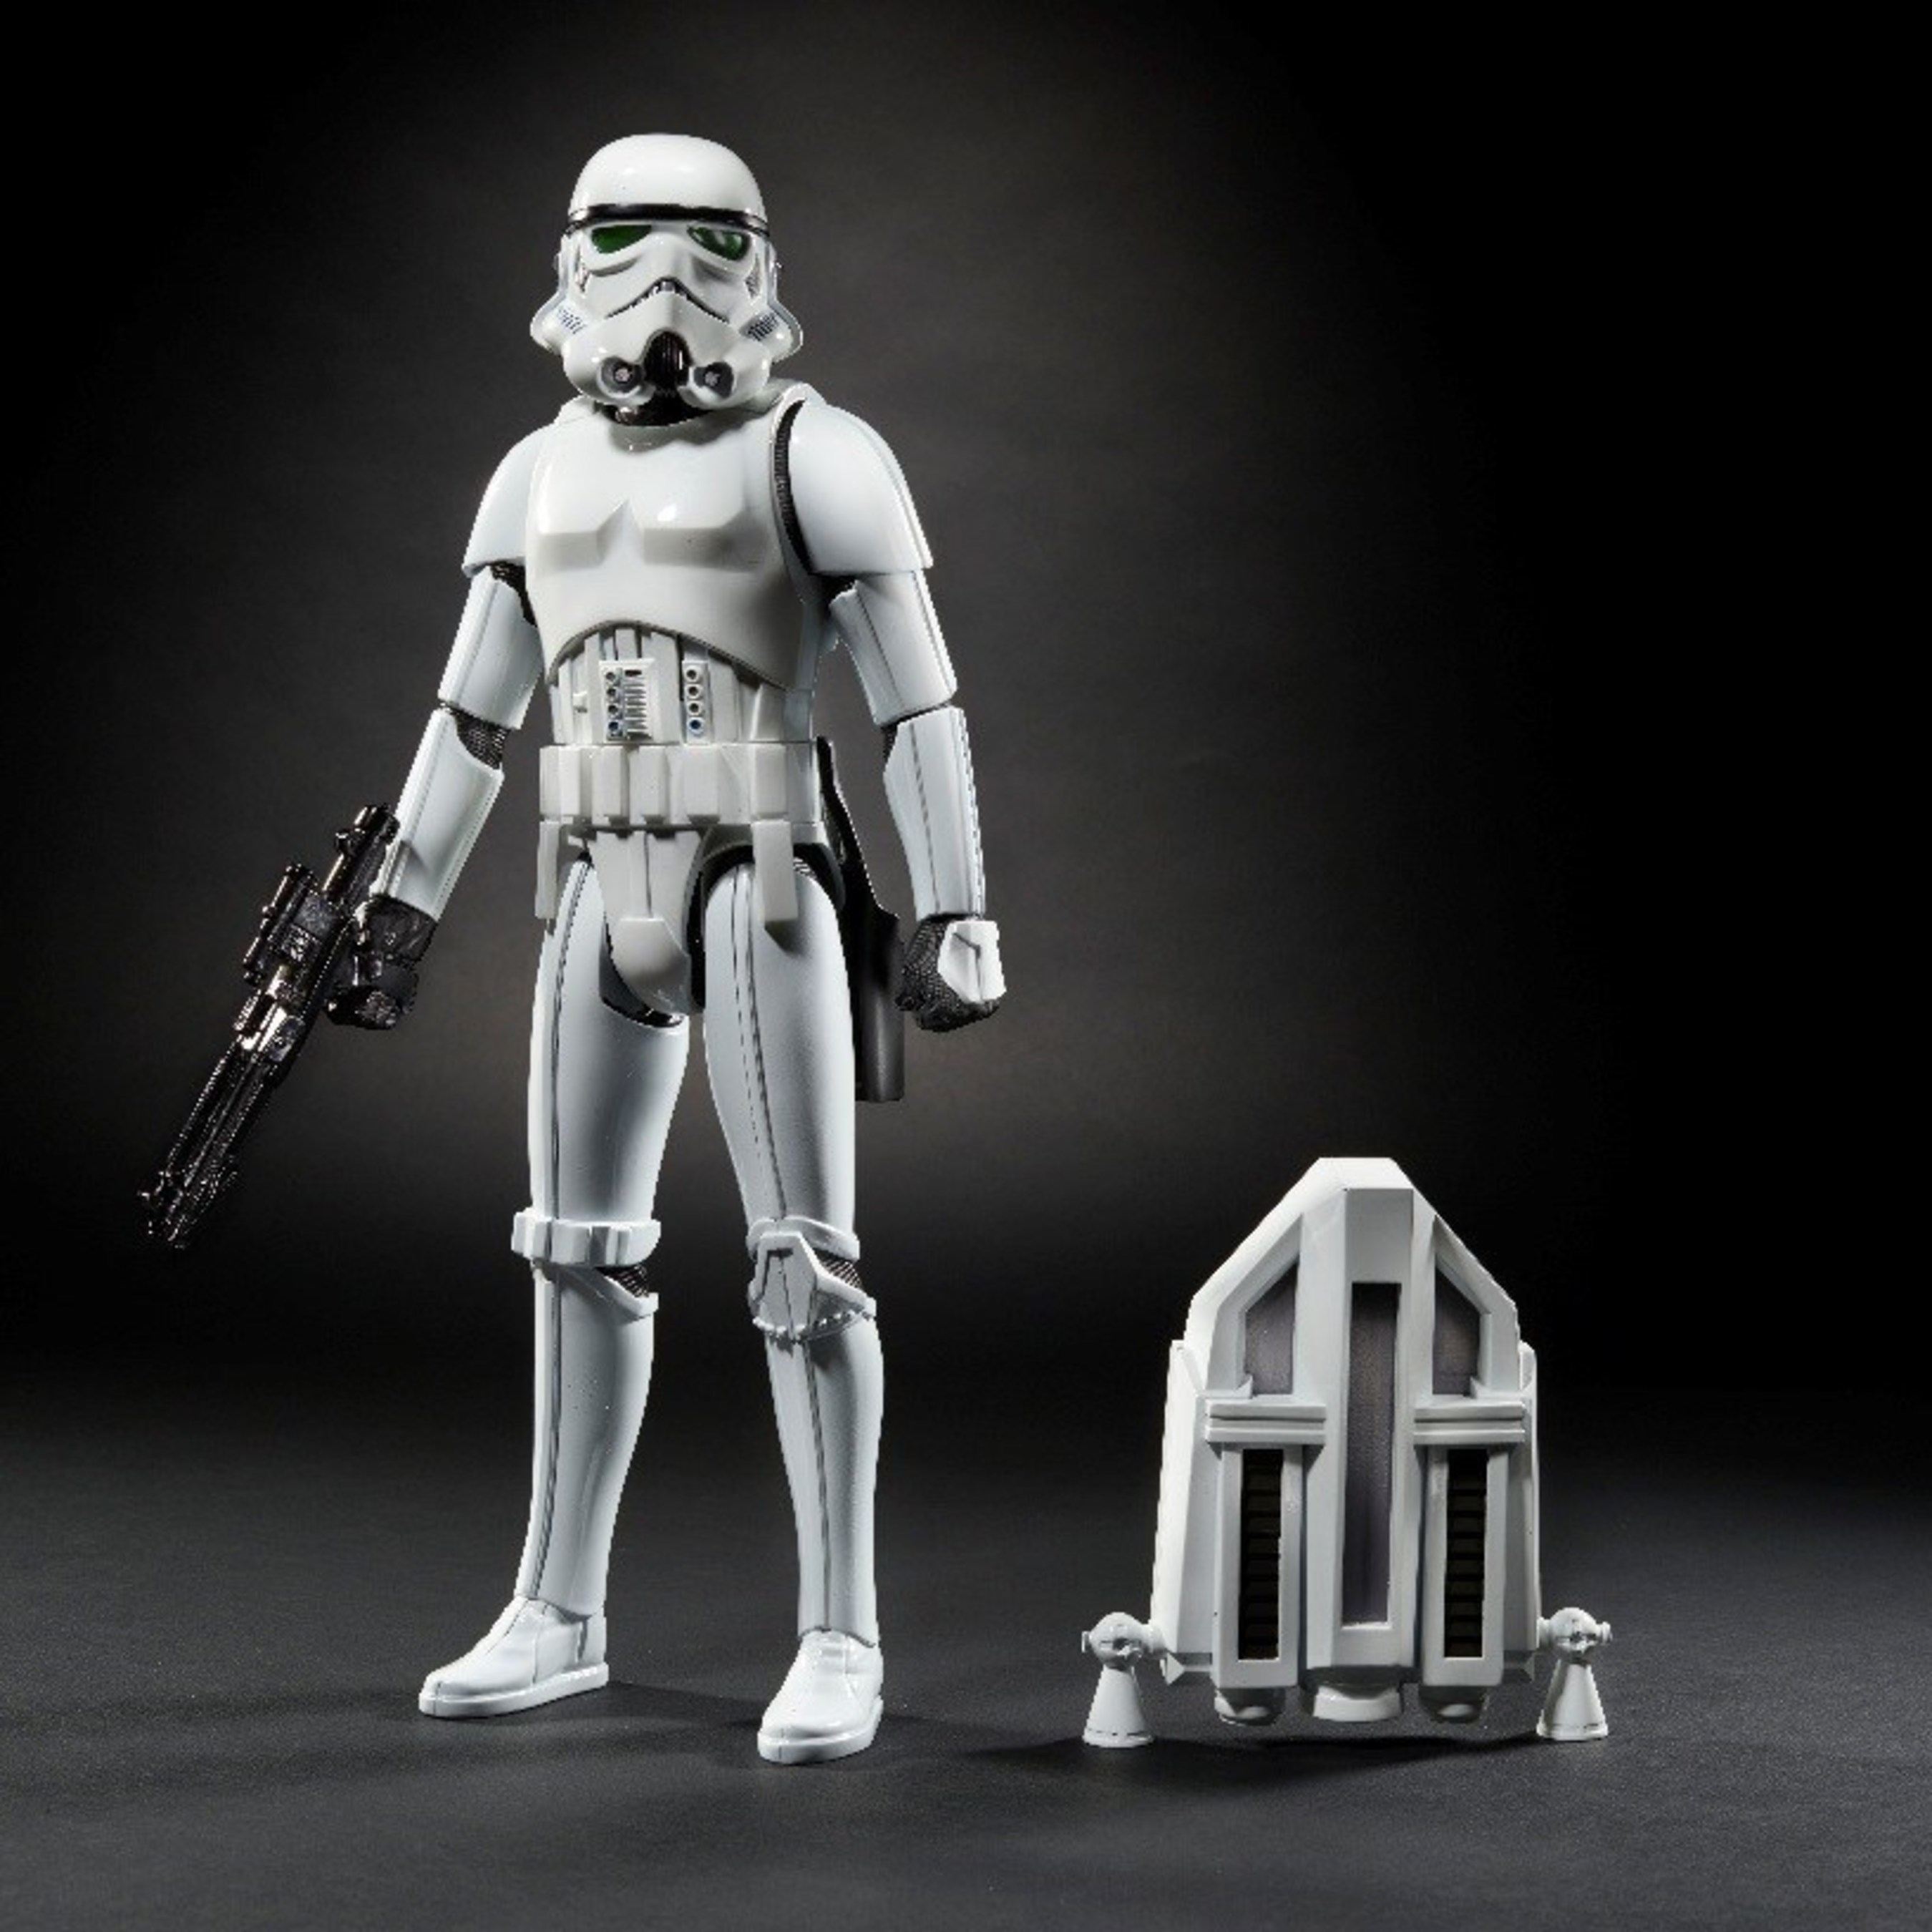 STAR WARS(TM) InteracTech Stormtrooper Figure from HASBRO(R)